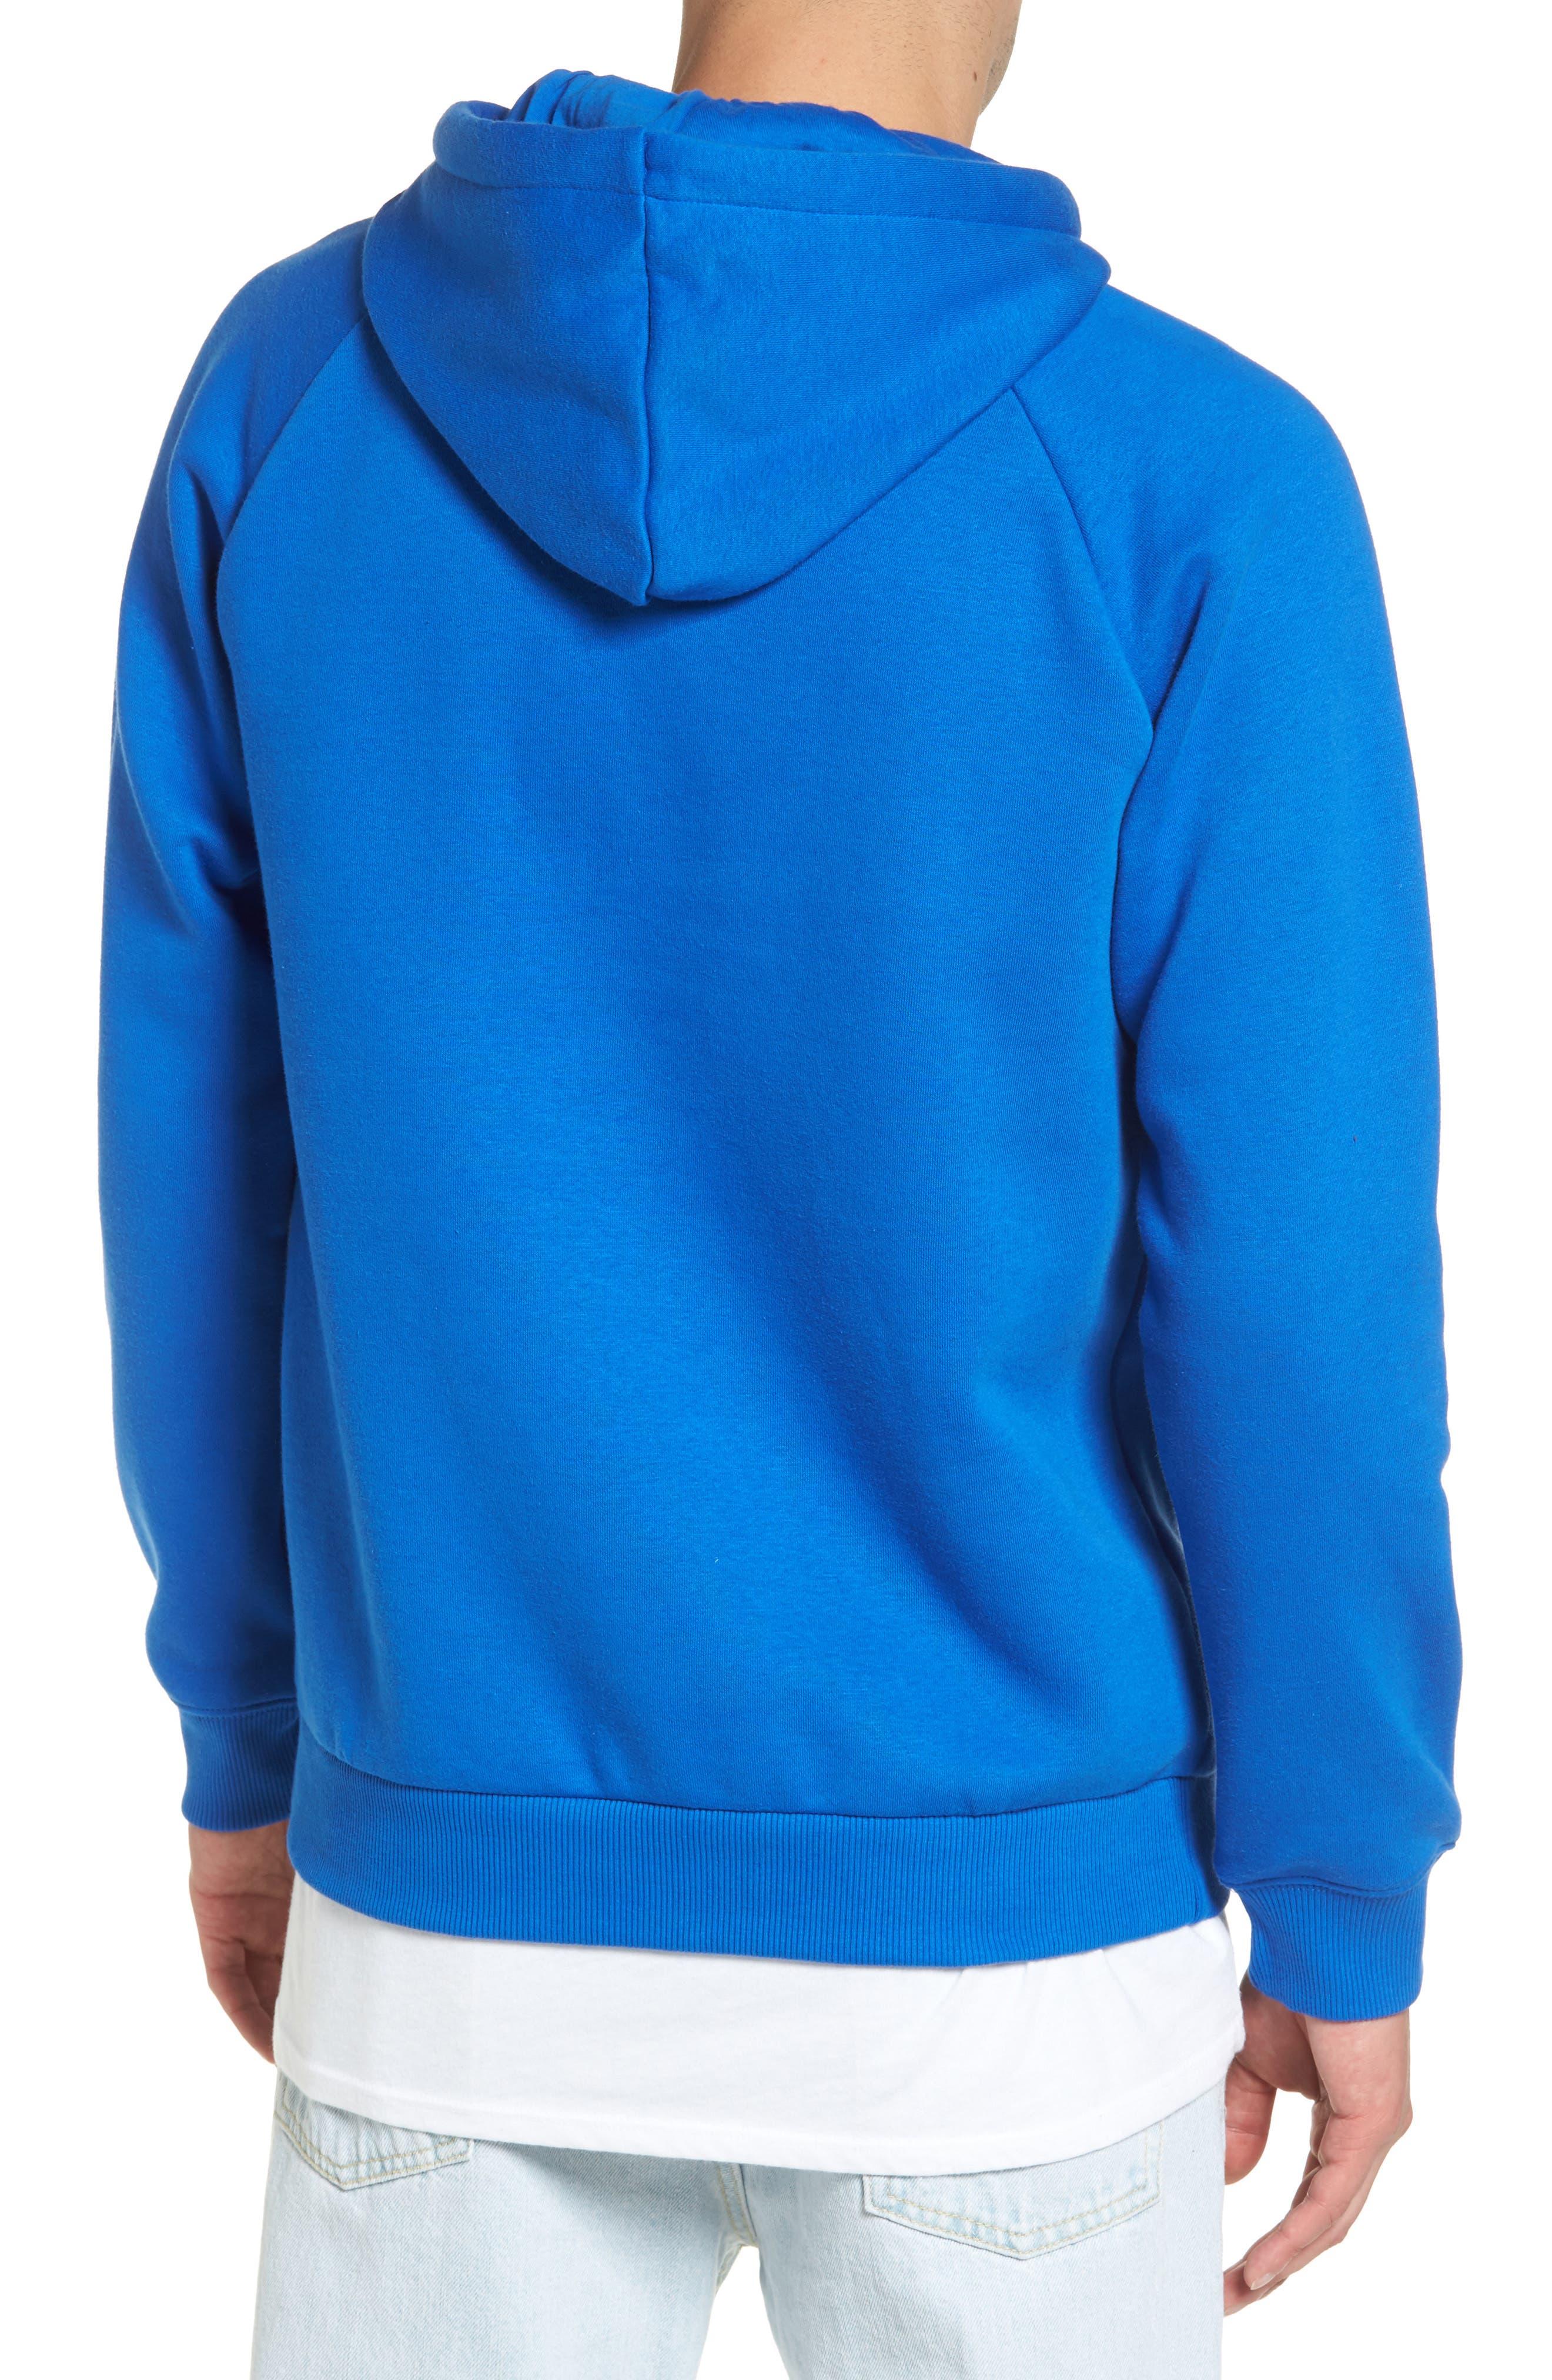 Sweatshirts & Hoodies adidas for Men: Activewear, Shoes & Watches ...